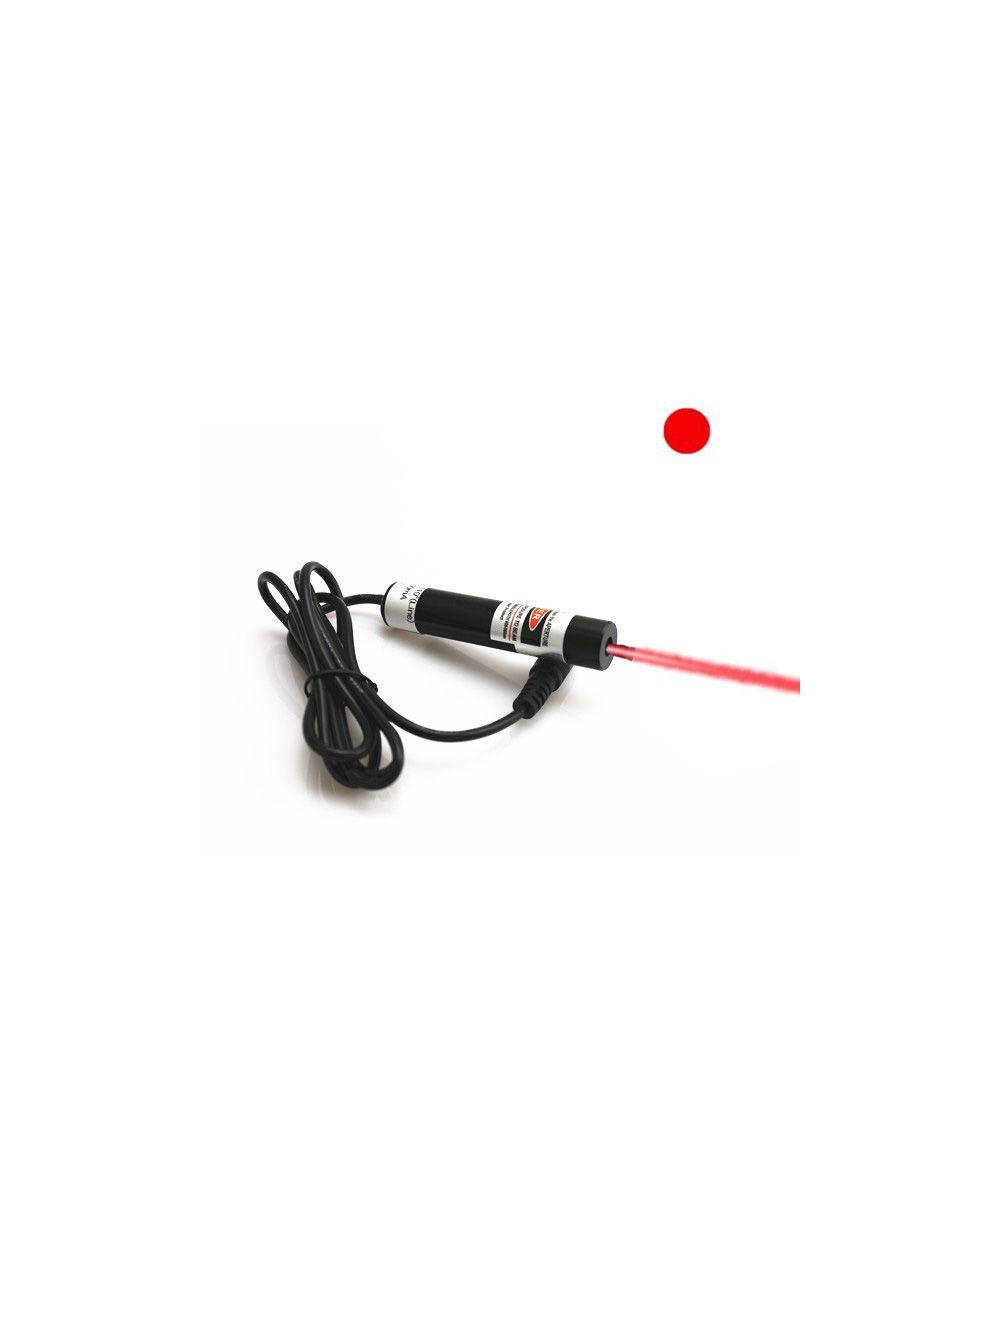 635nm Red Dot Laser Diode Modules